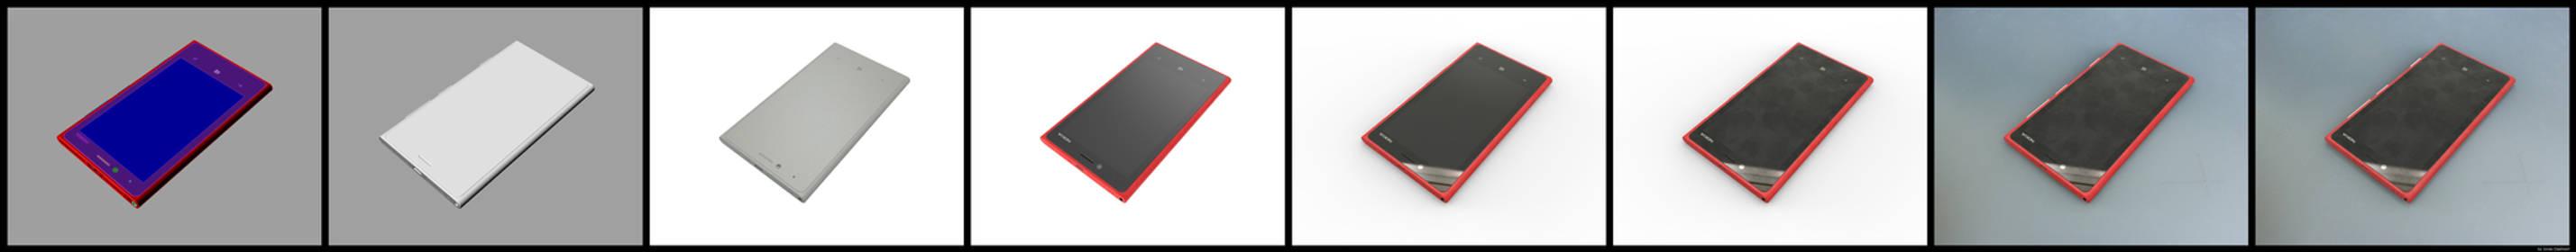 Photorealistic Rendering Steps Nokia Lumia 820